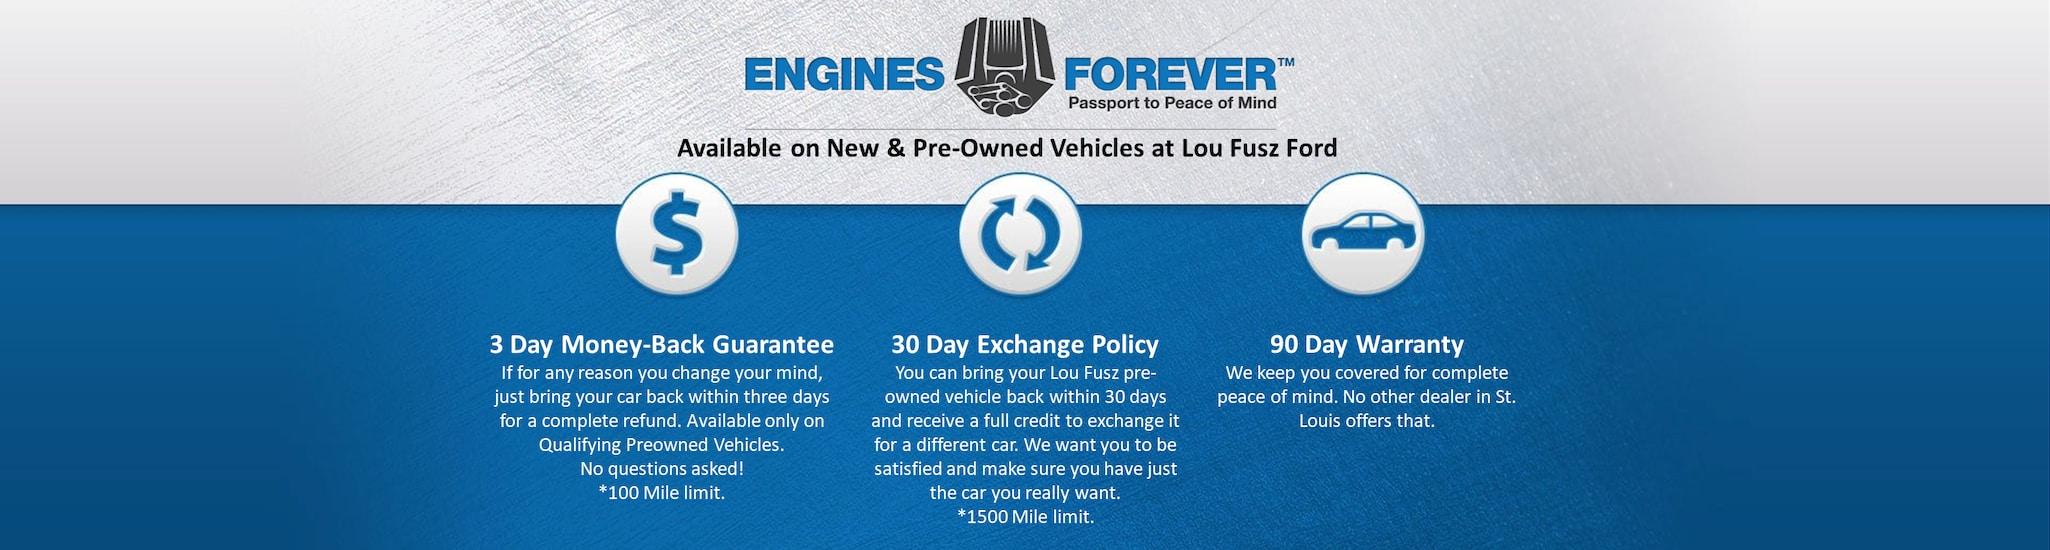 Lou Fusz Ford >> Ford Dealership St Louis Lou Fusz Ford